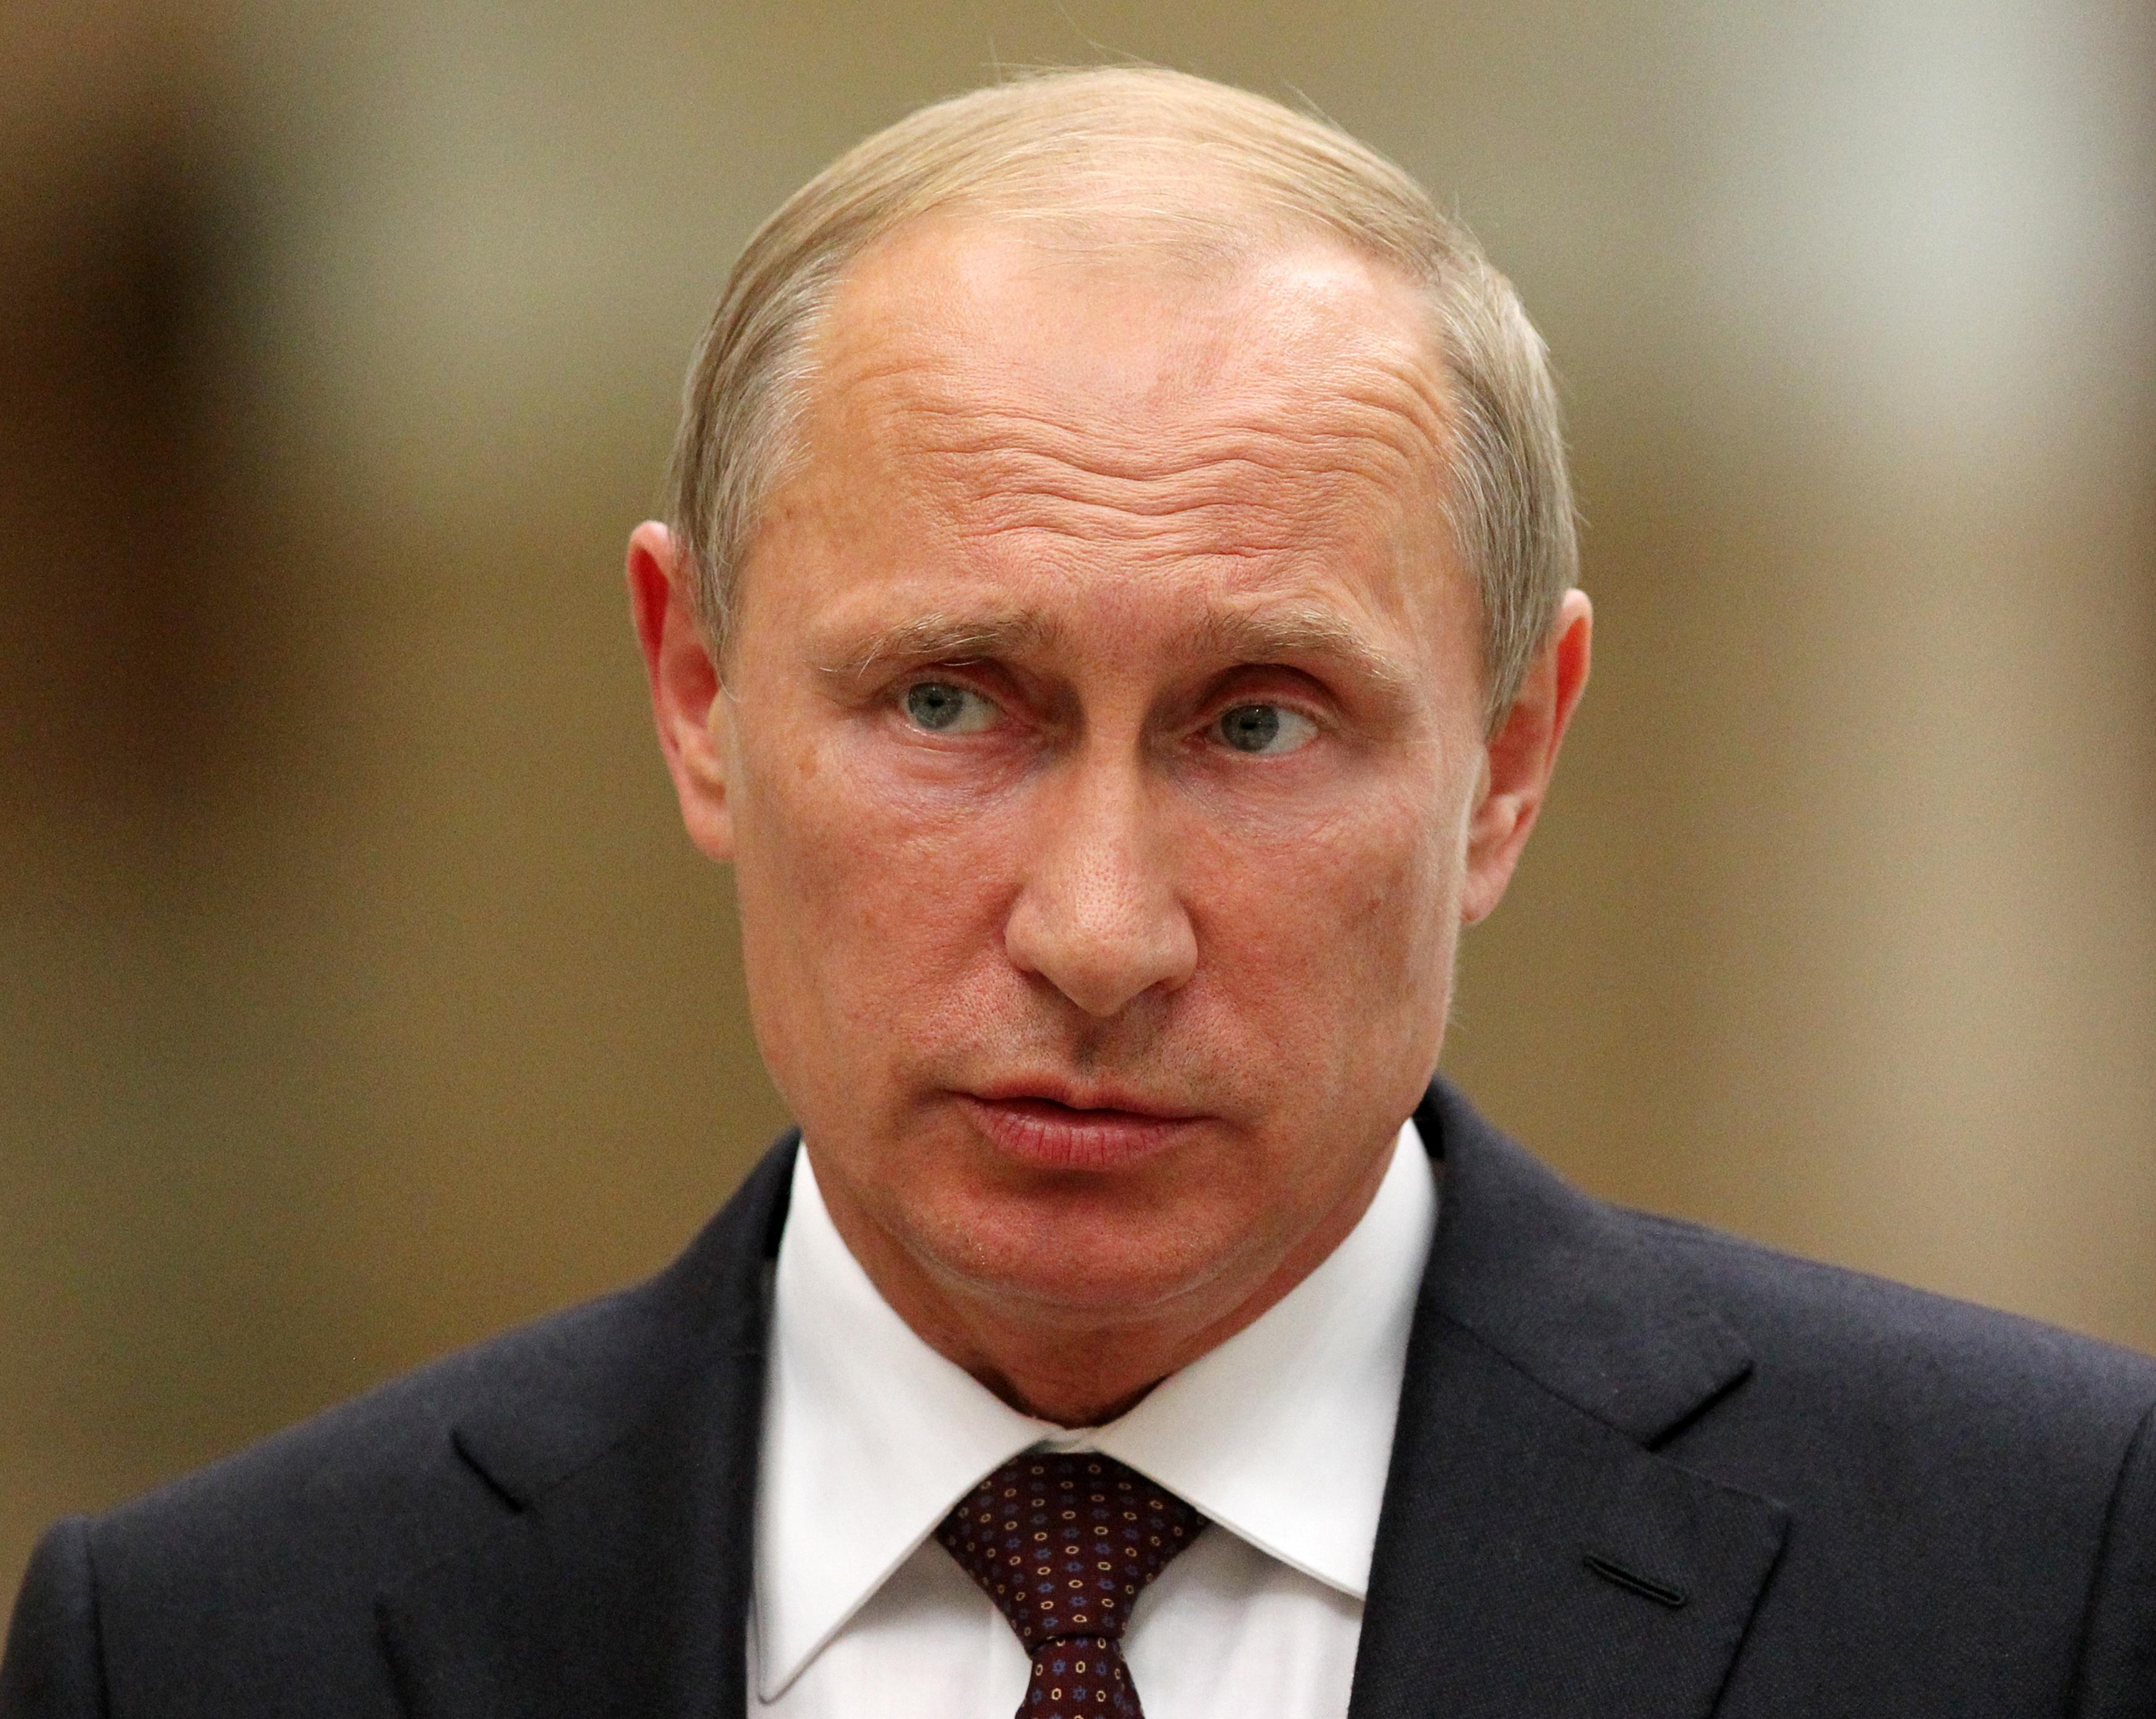 Russian President Vladimir Putin speaks at a news conference on Aug. 26, 2014, in Minsk, Belarus